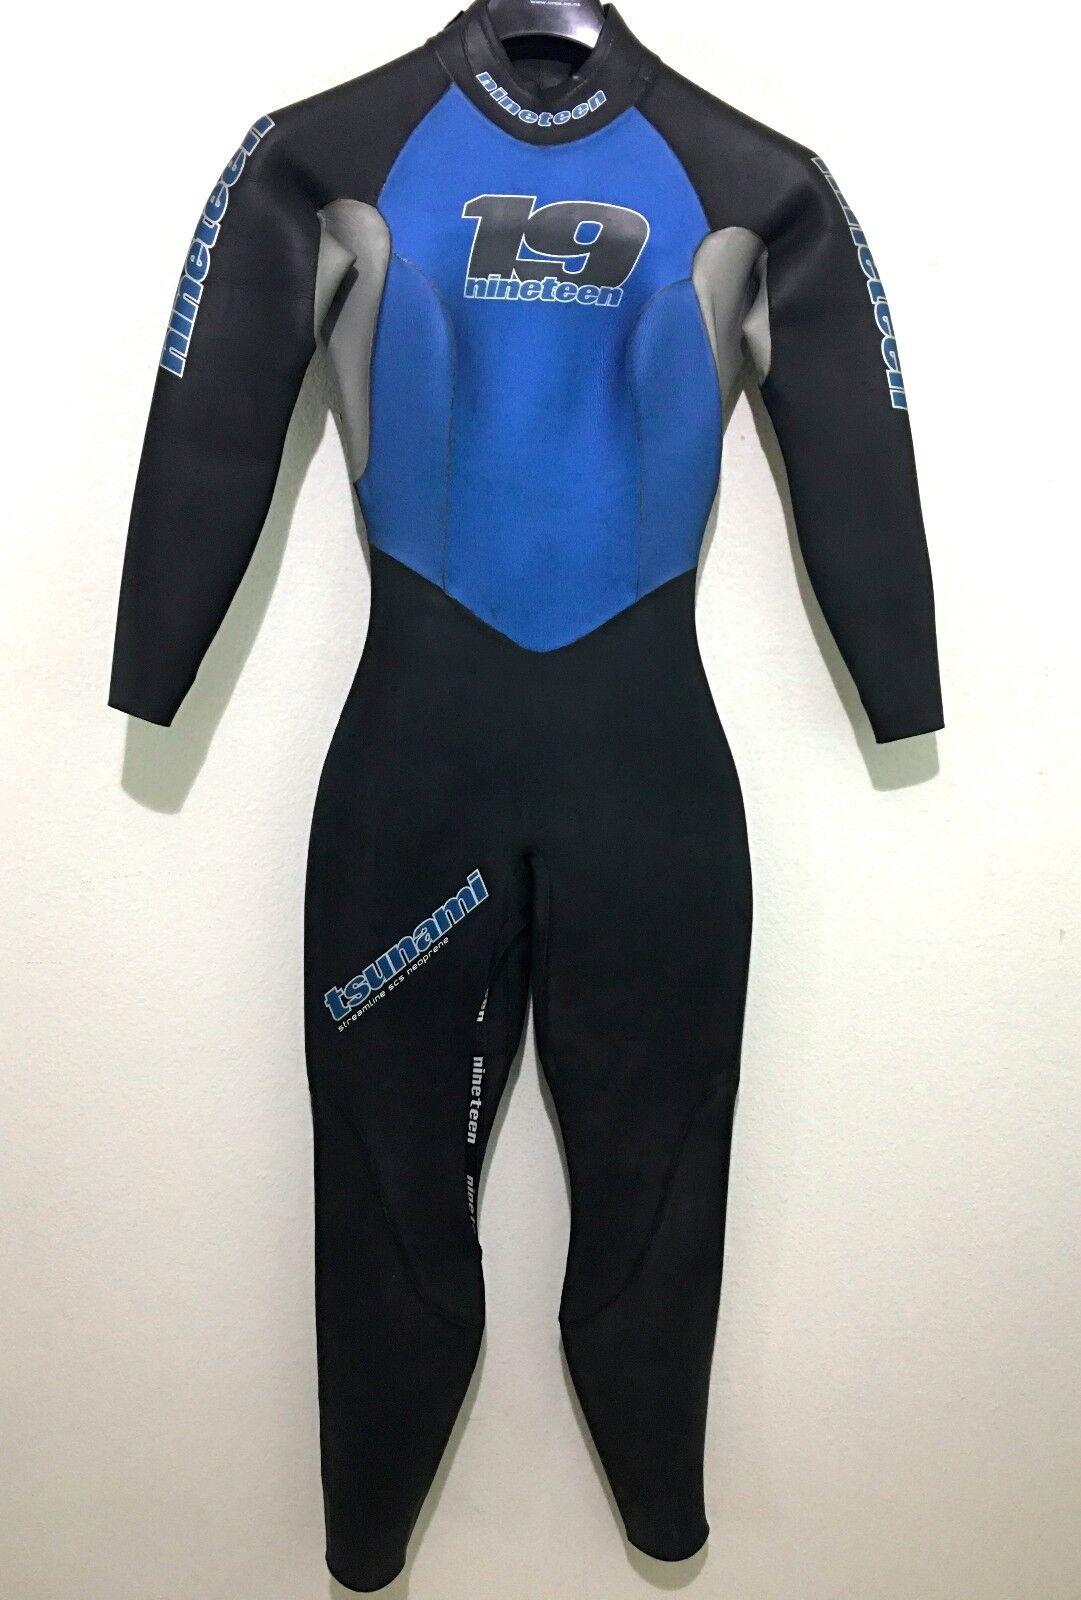 Nineteen 19 Womens Triathlon Wetsuit Tsunami Full Suit Size Small S Retail